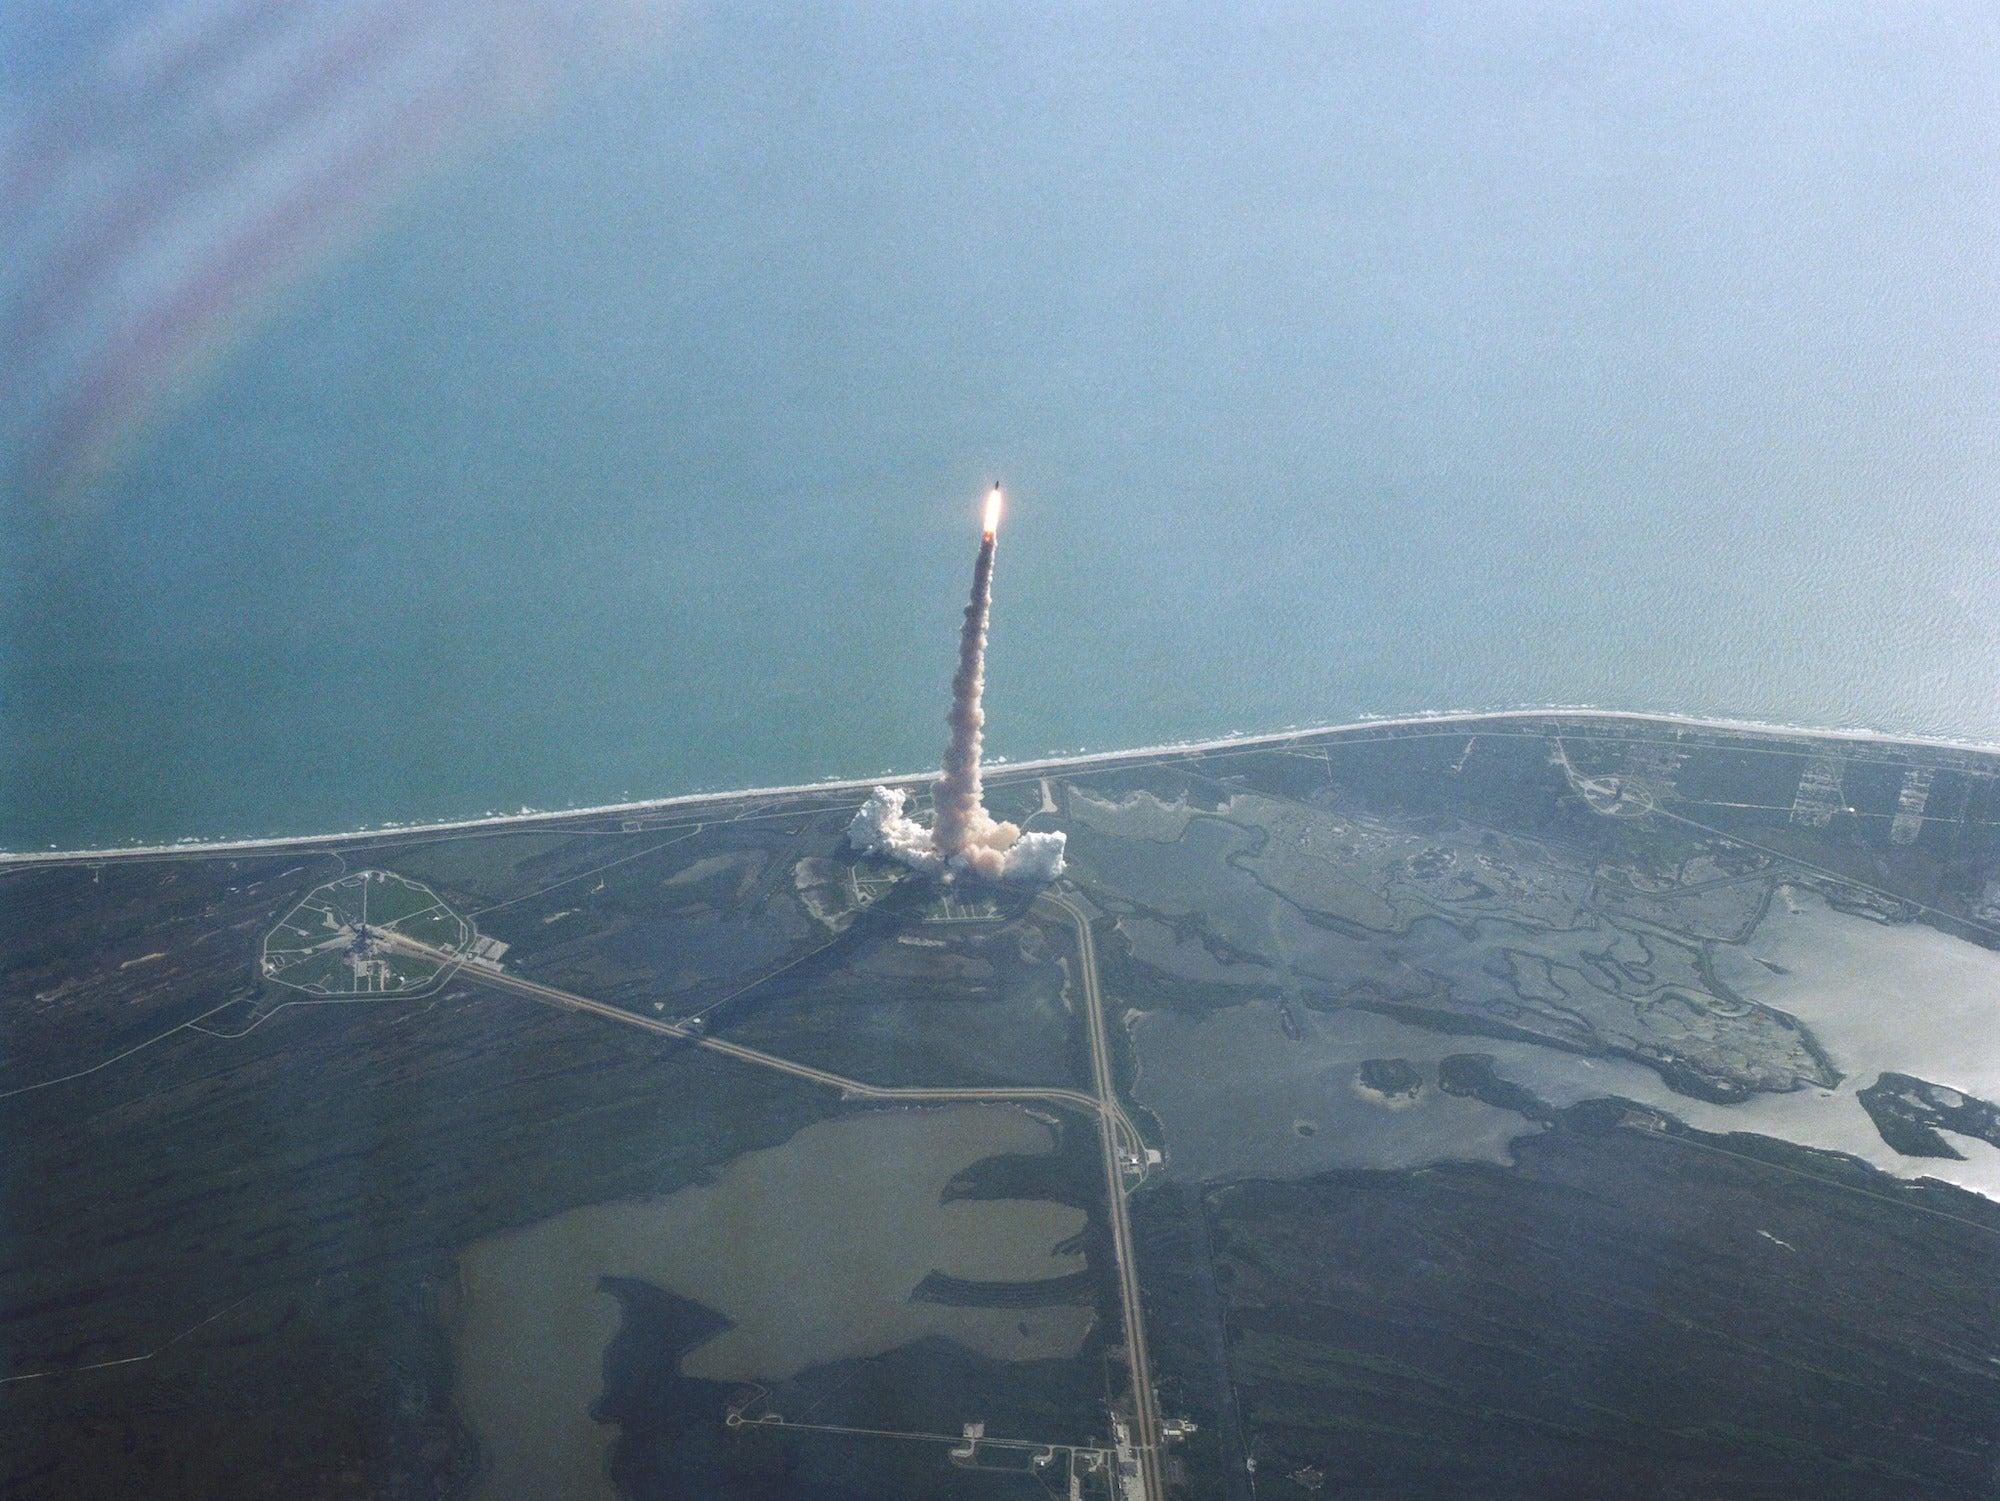 NASA space shuttle Challenger blasts off.